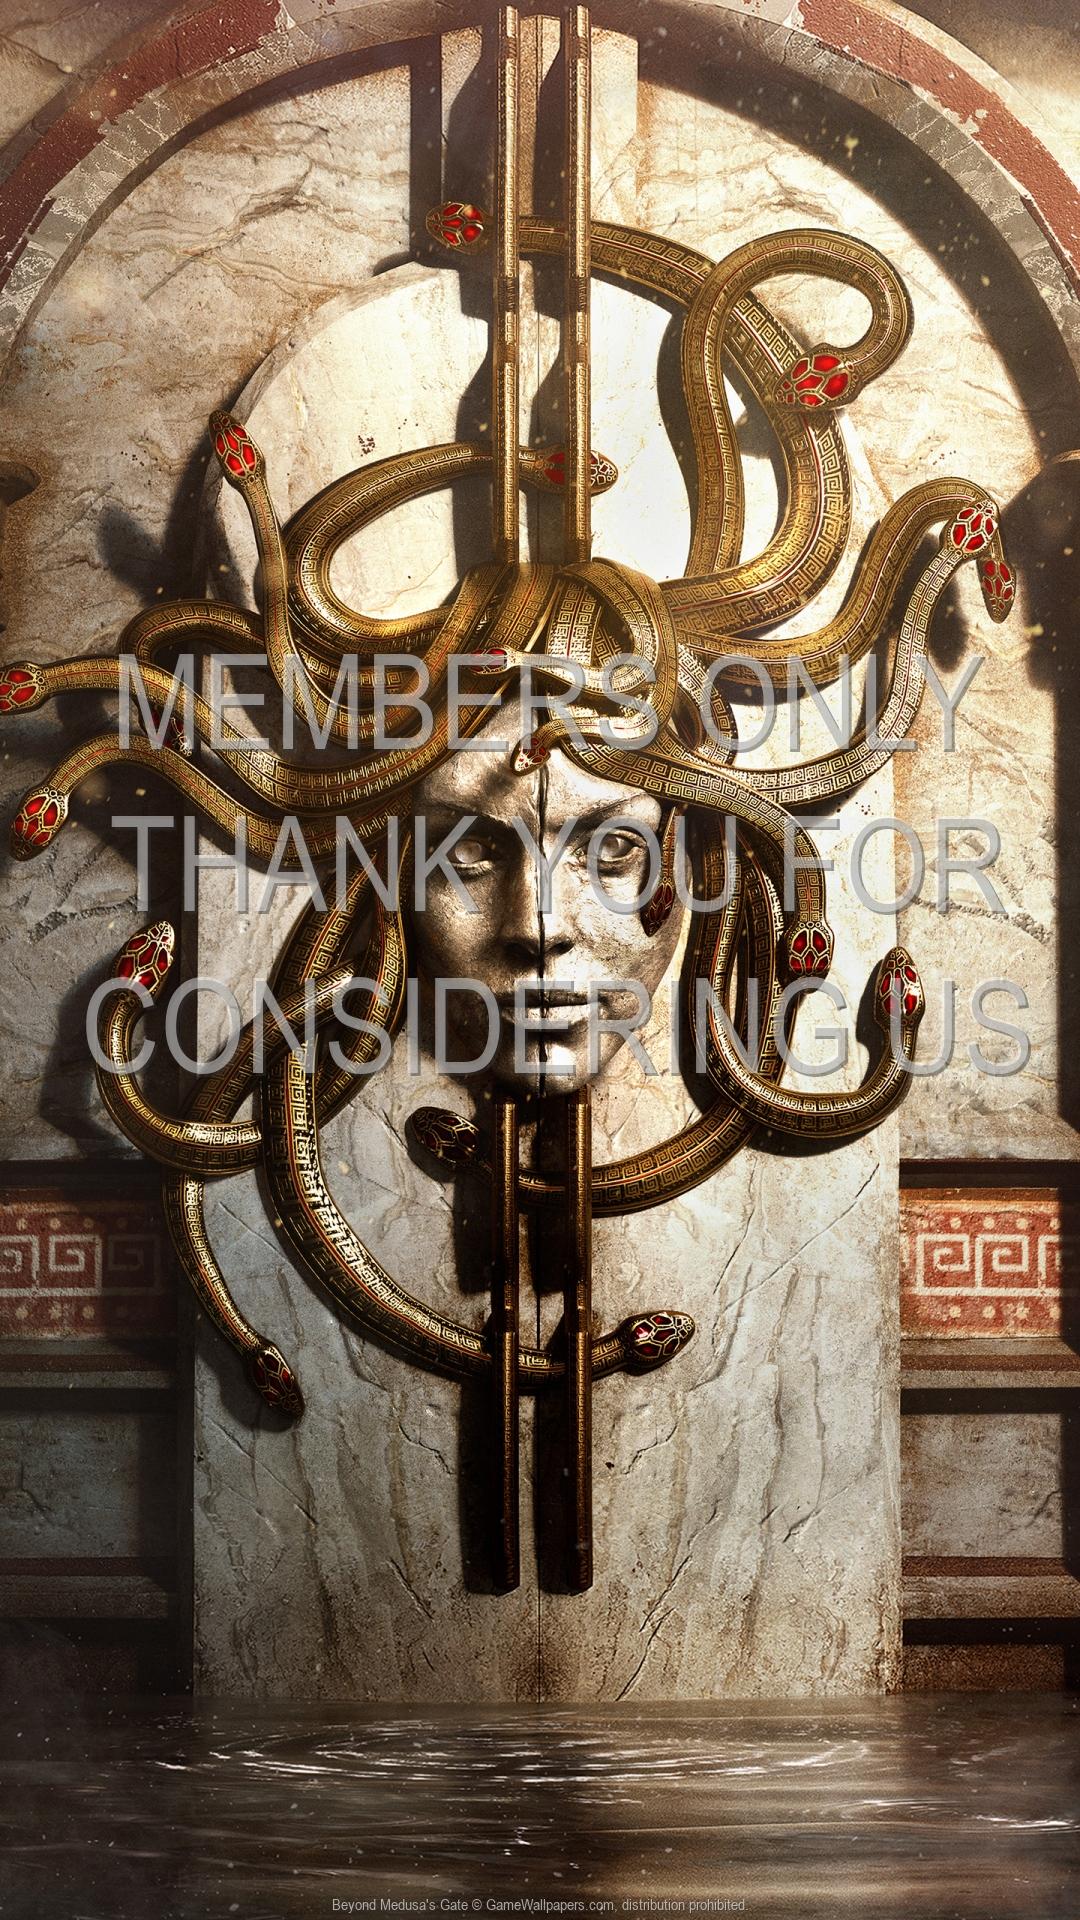 Beyond Medusa's Gate 1920x1080 Mobiele achtergrond 01